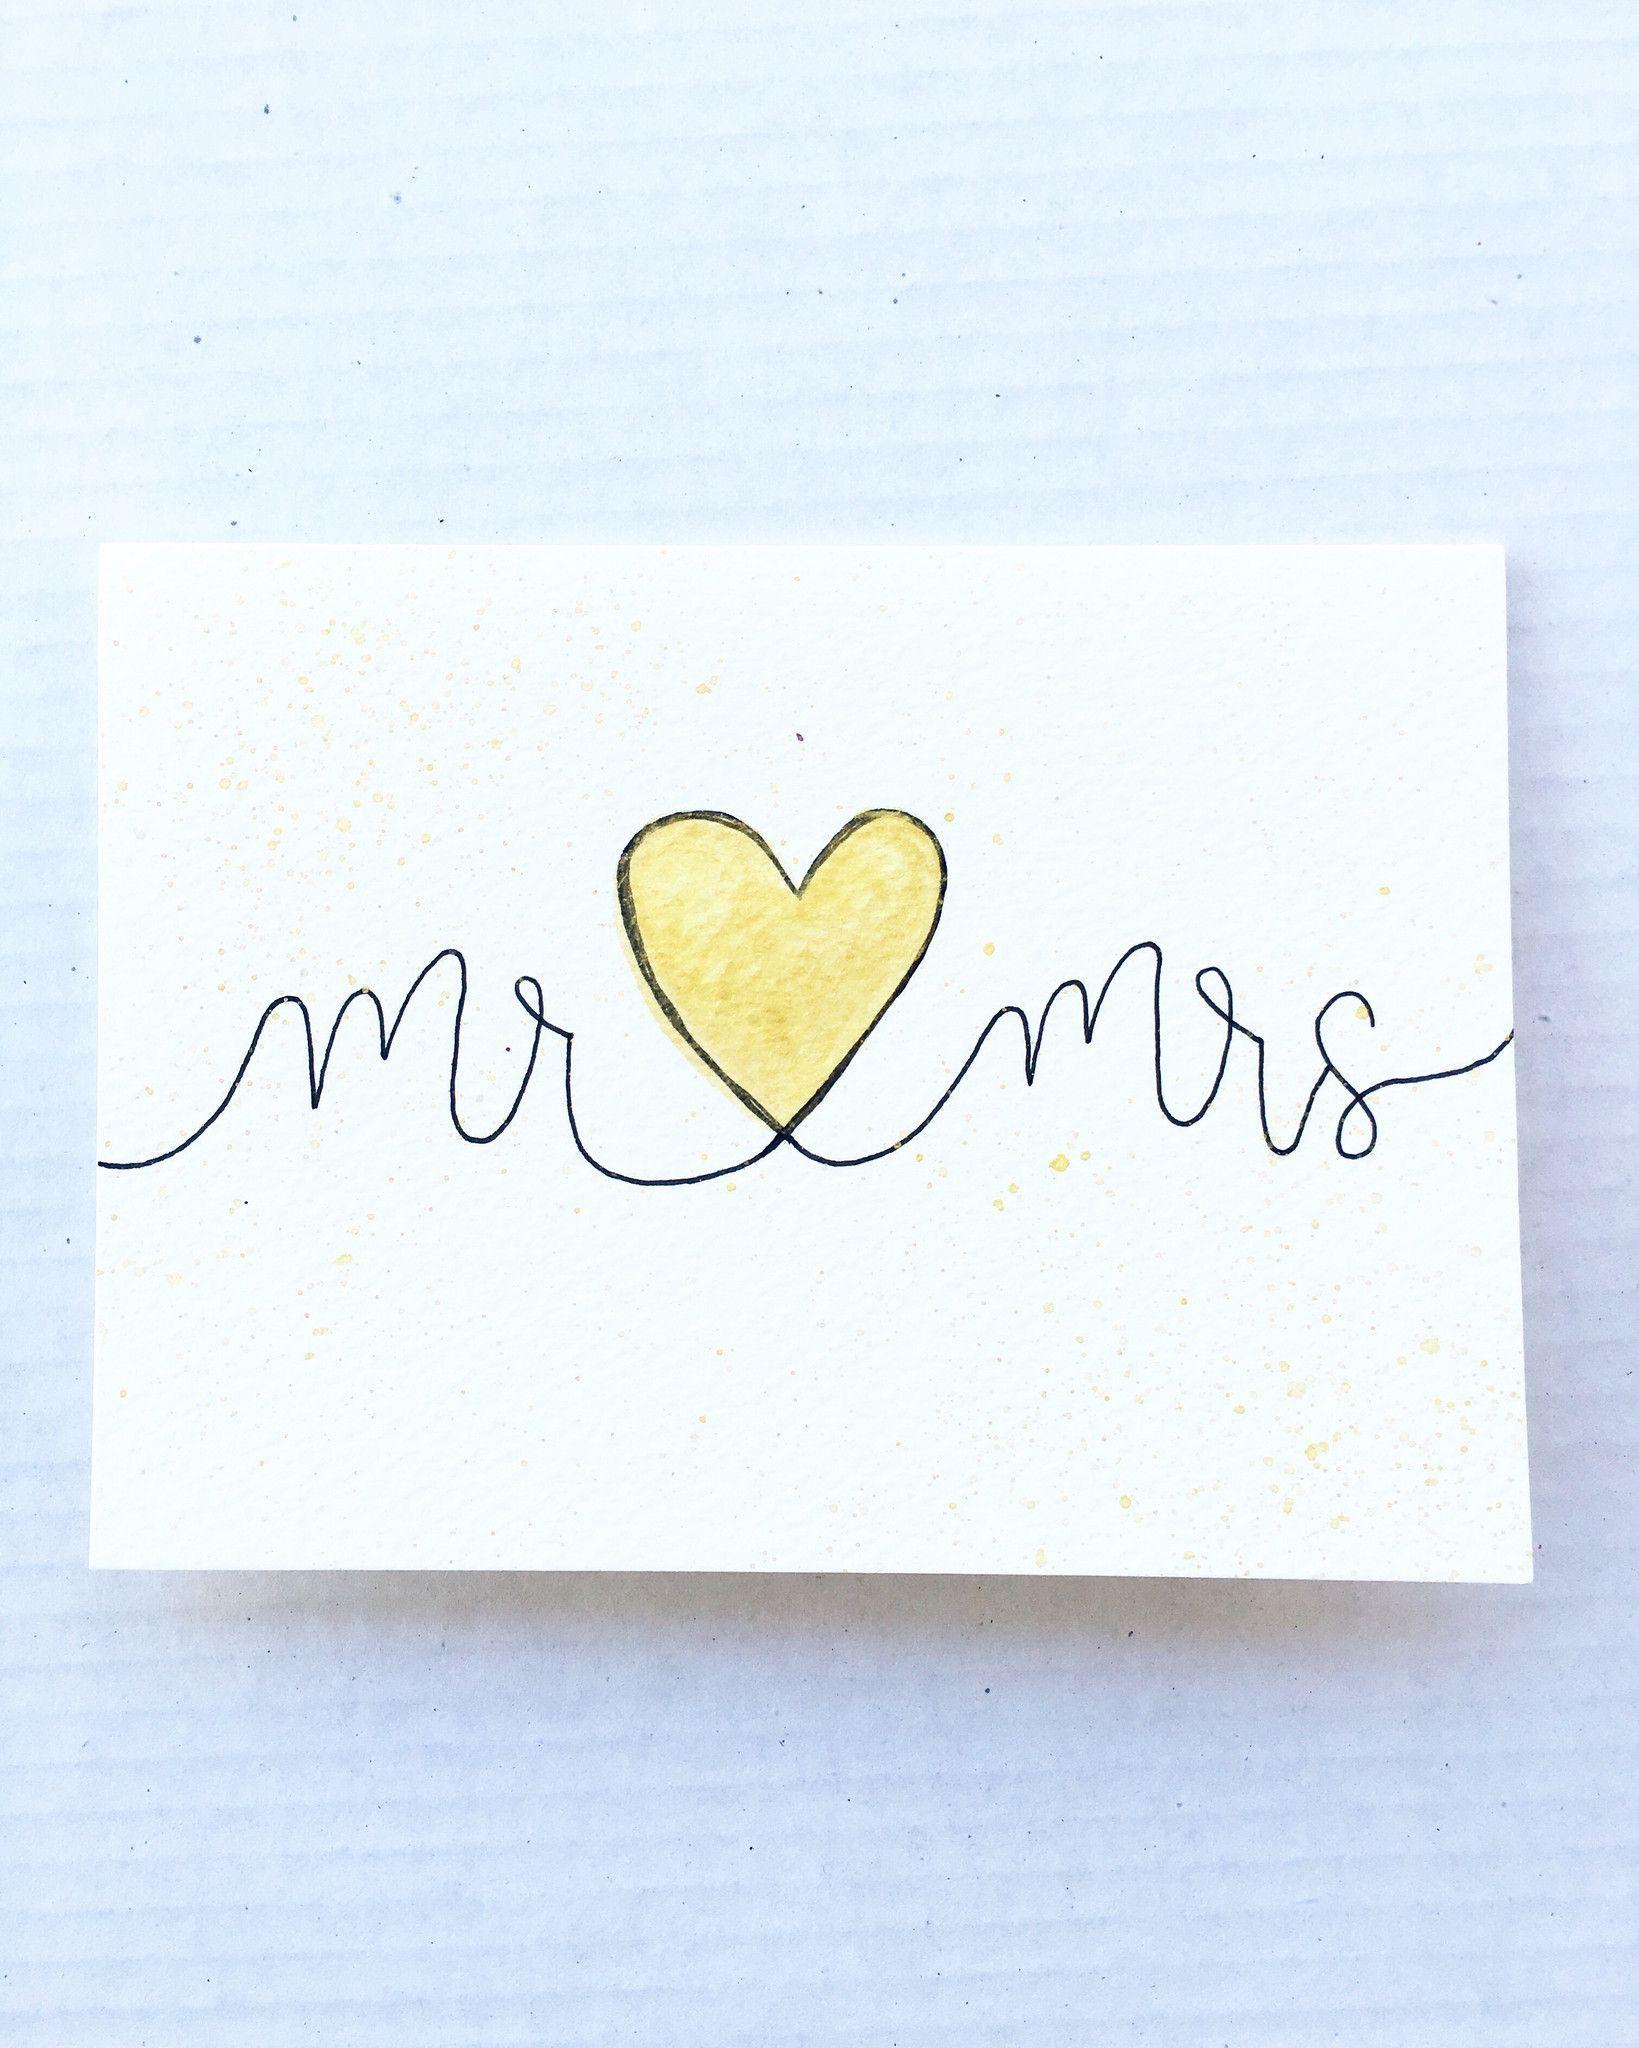 Hand Lettered Wedding Card Blank Inside Envelope Included Size 5